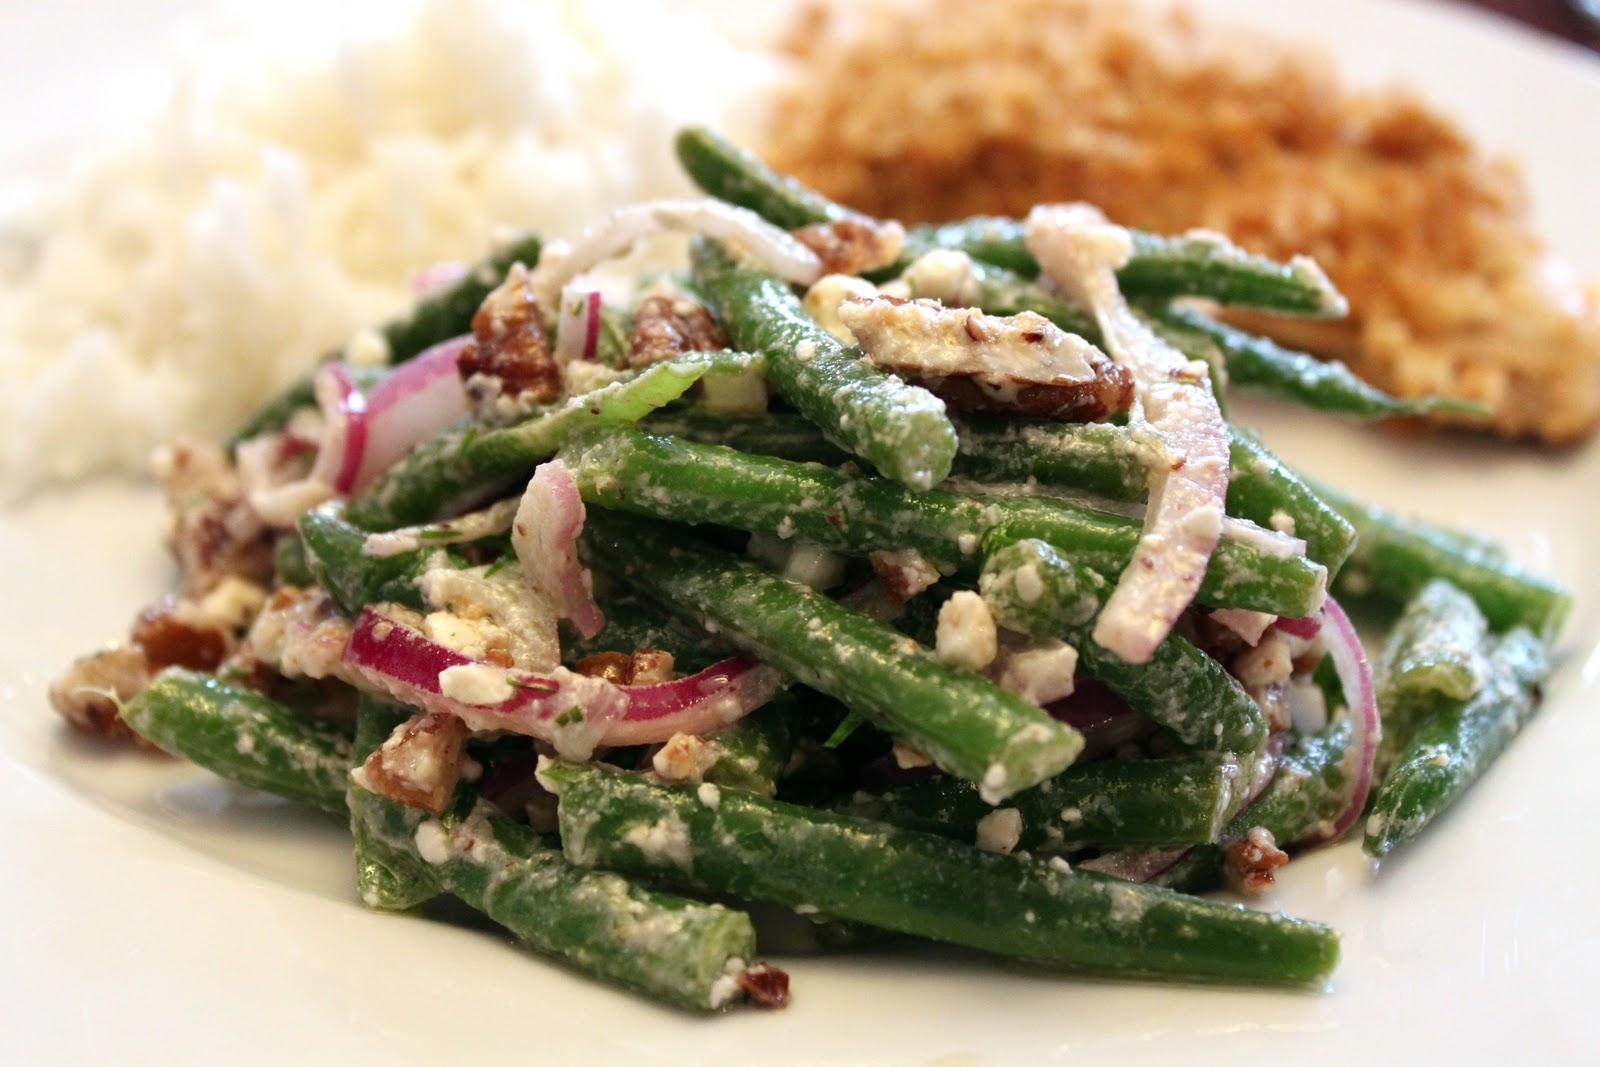 Salads and Such: Green Bean, Walnut, & Feta Salad